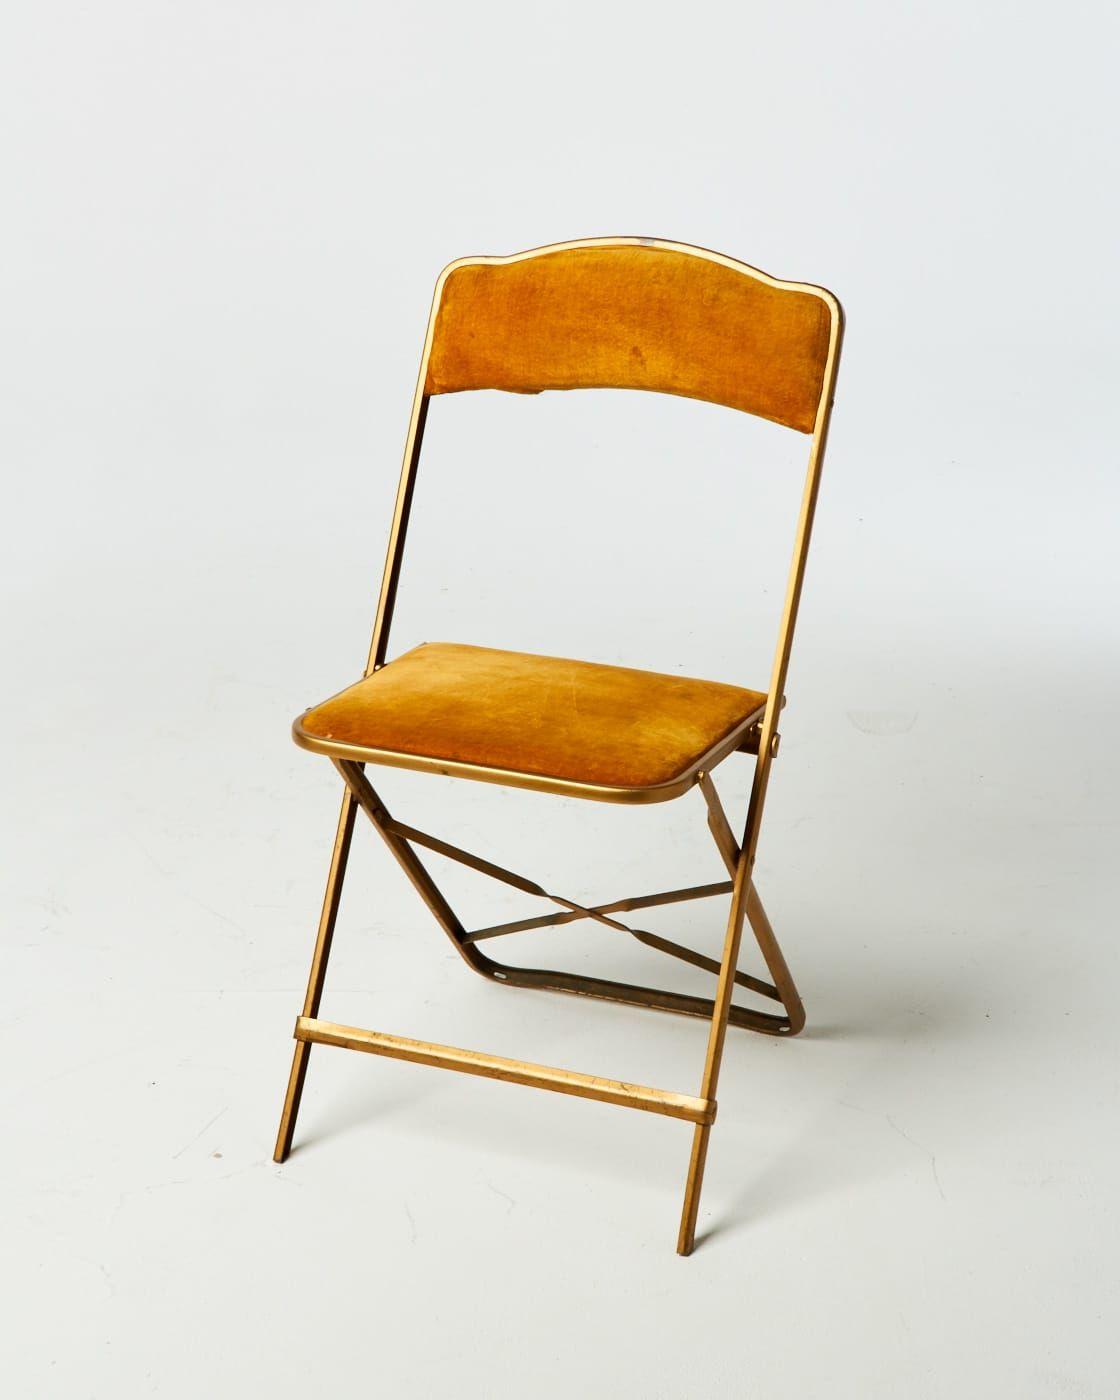 Peachy Ch111 Velvet Folding Metal Chair Prop Rental Acme Brooklyn Ncnpc Chair Design For Home Ncnpcorg